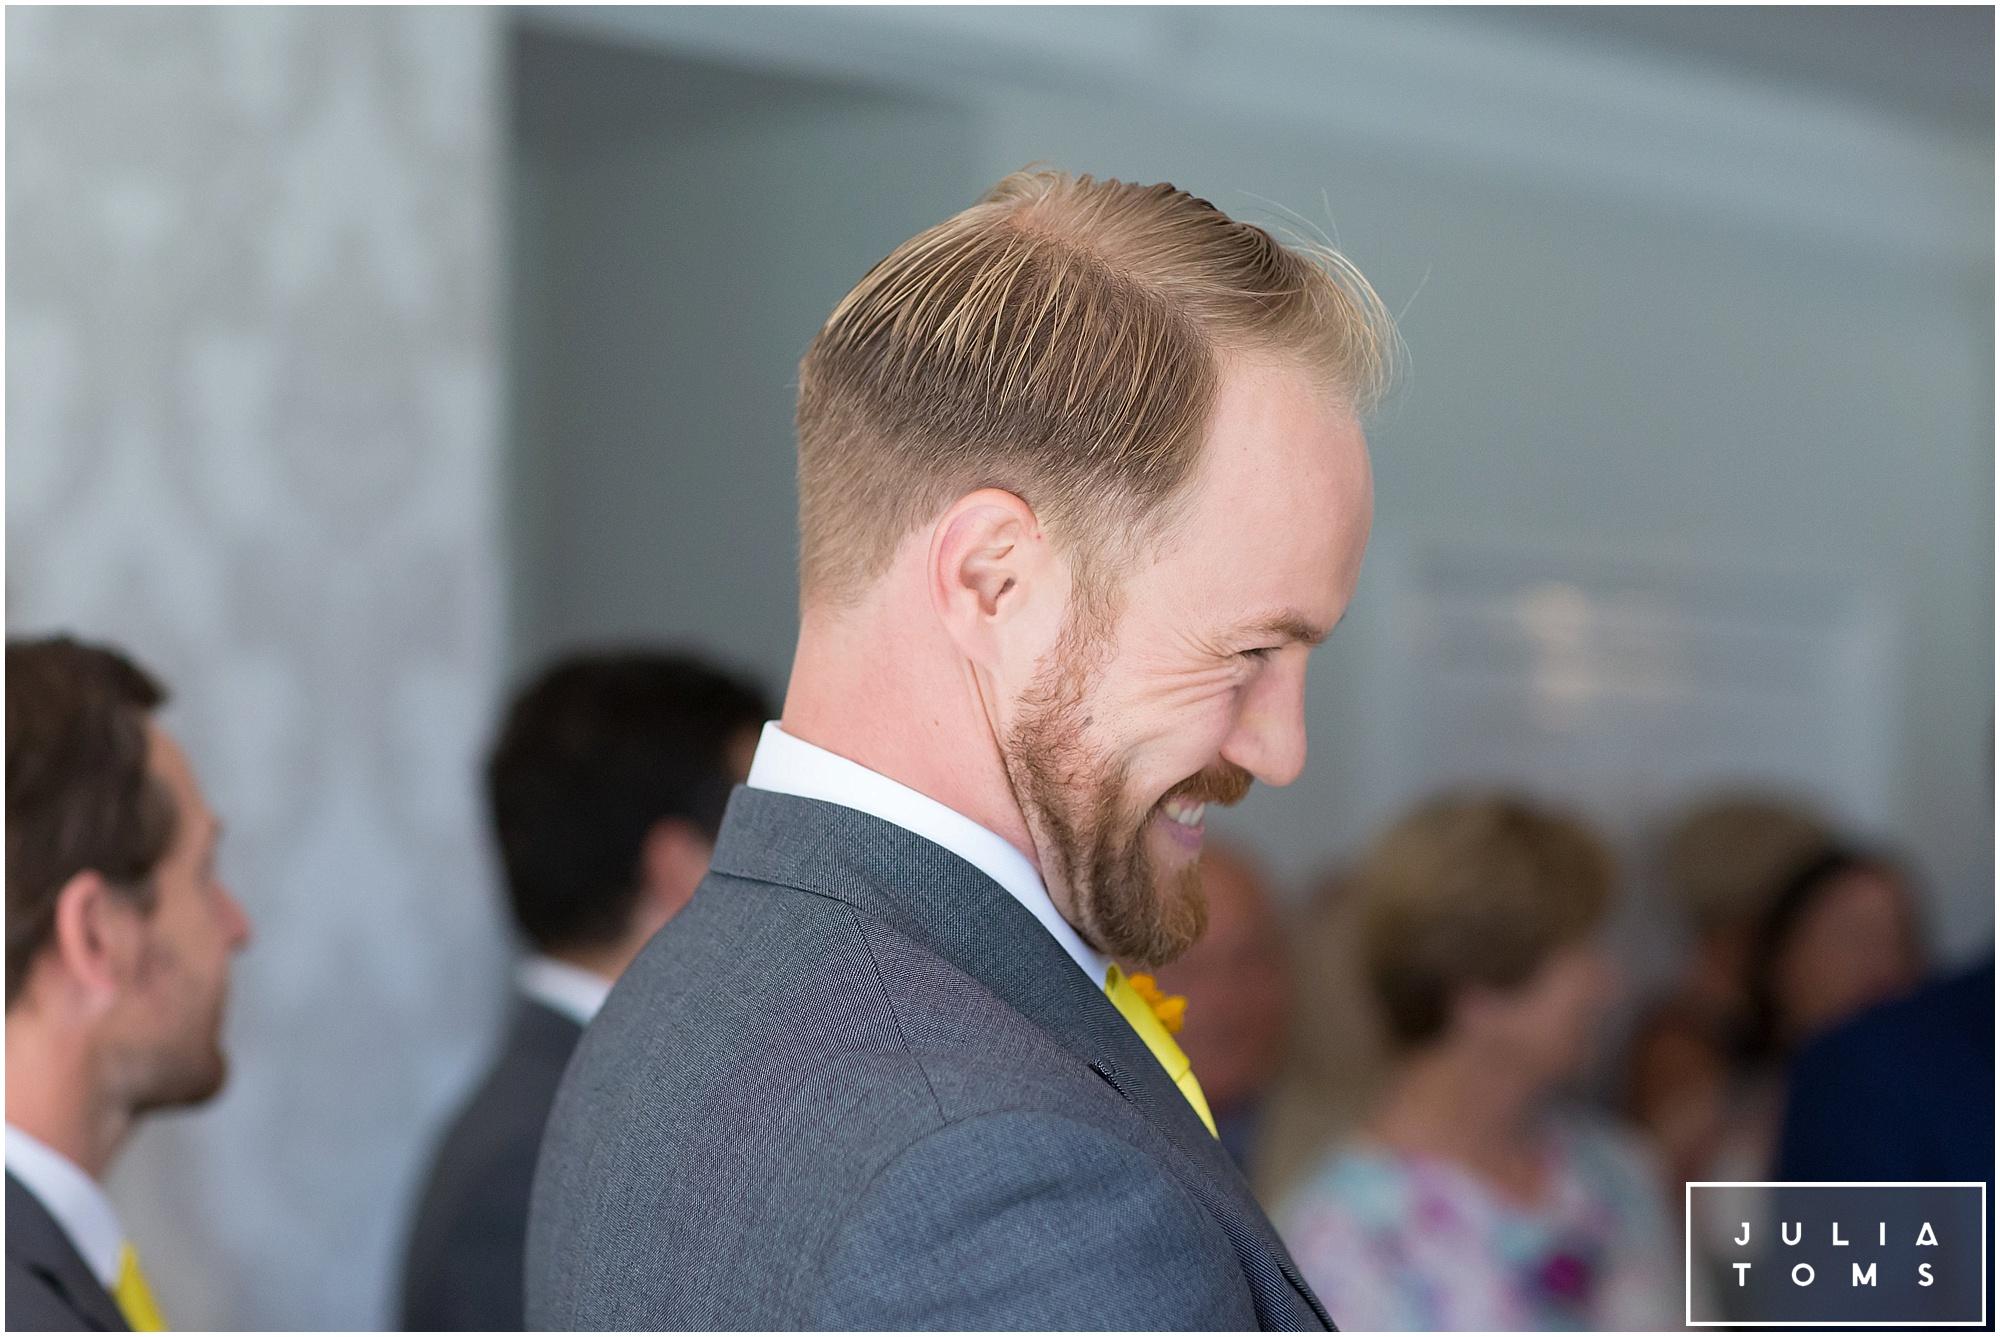 julia_toms_chichester_wedding_photographer_worthing_025.jpg